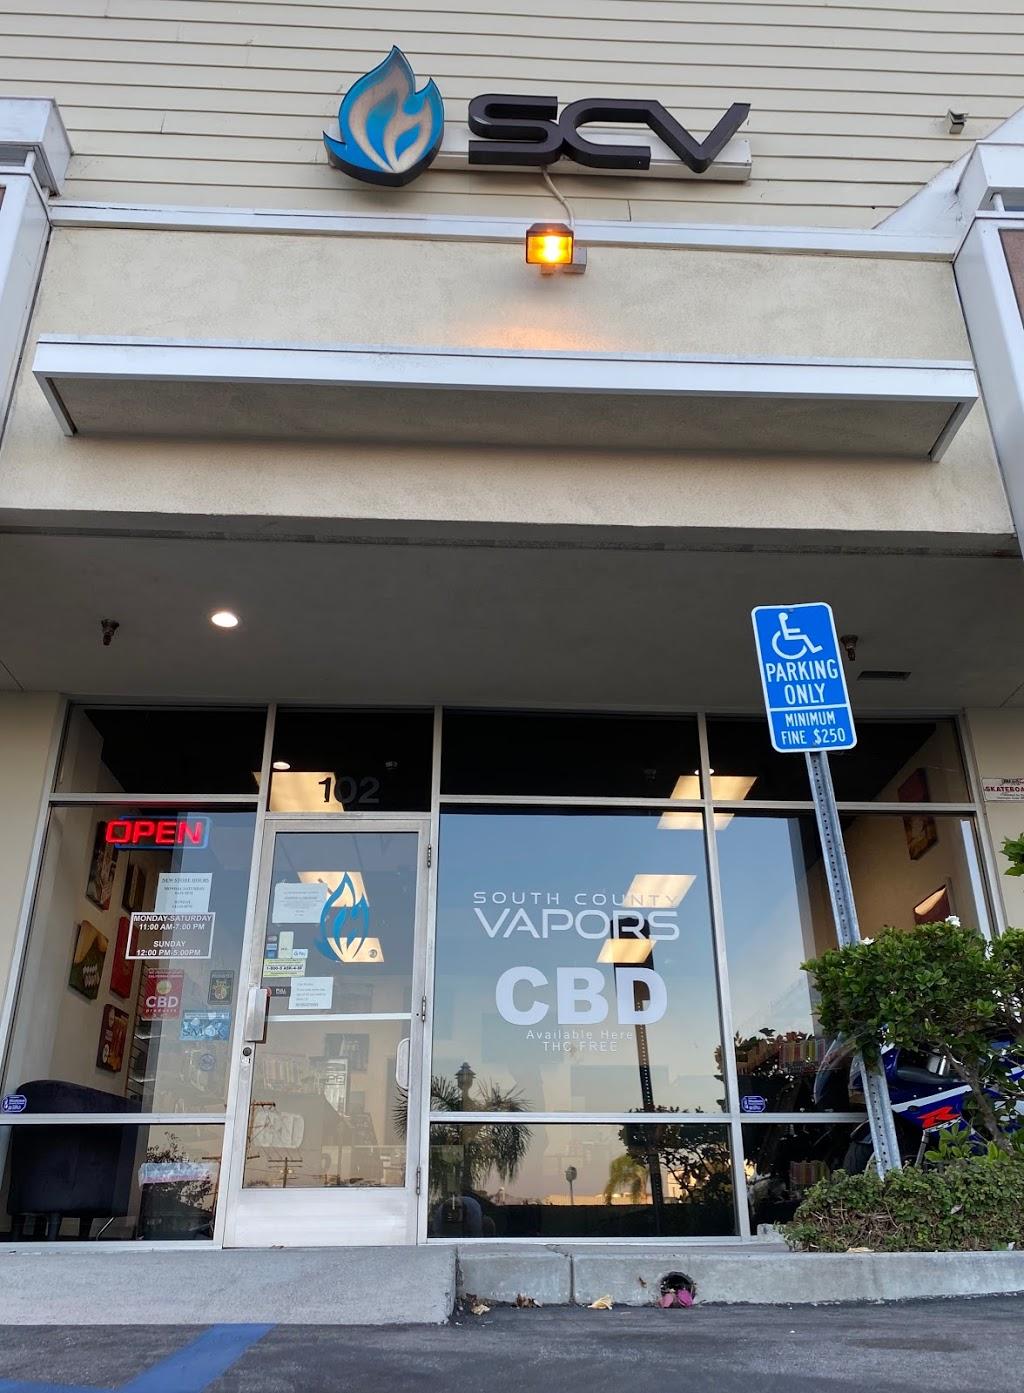 South County Vapors & CBD Dana Point - store  | Photo 1 of 10 | Address: 34085 CA-1 #102, Dana Point, CA 92629, USA | Phone: (949) 503-1590